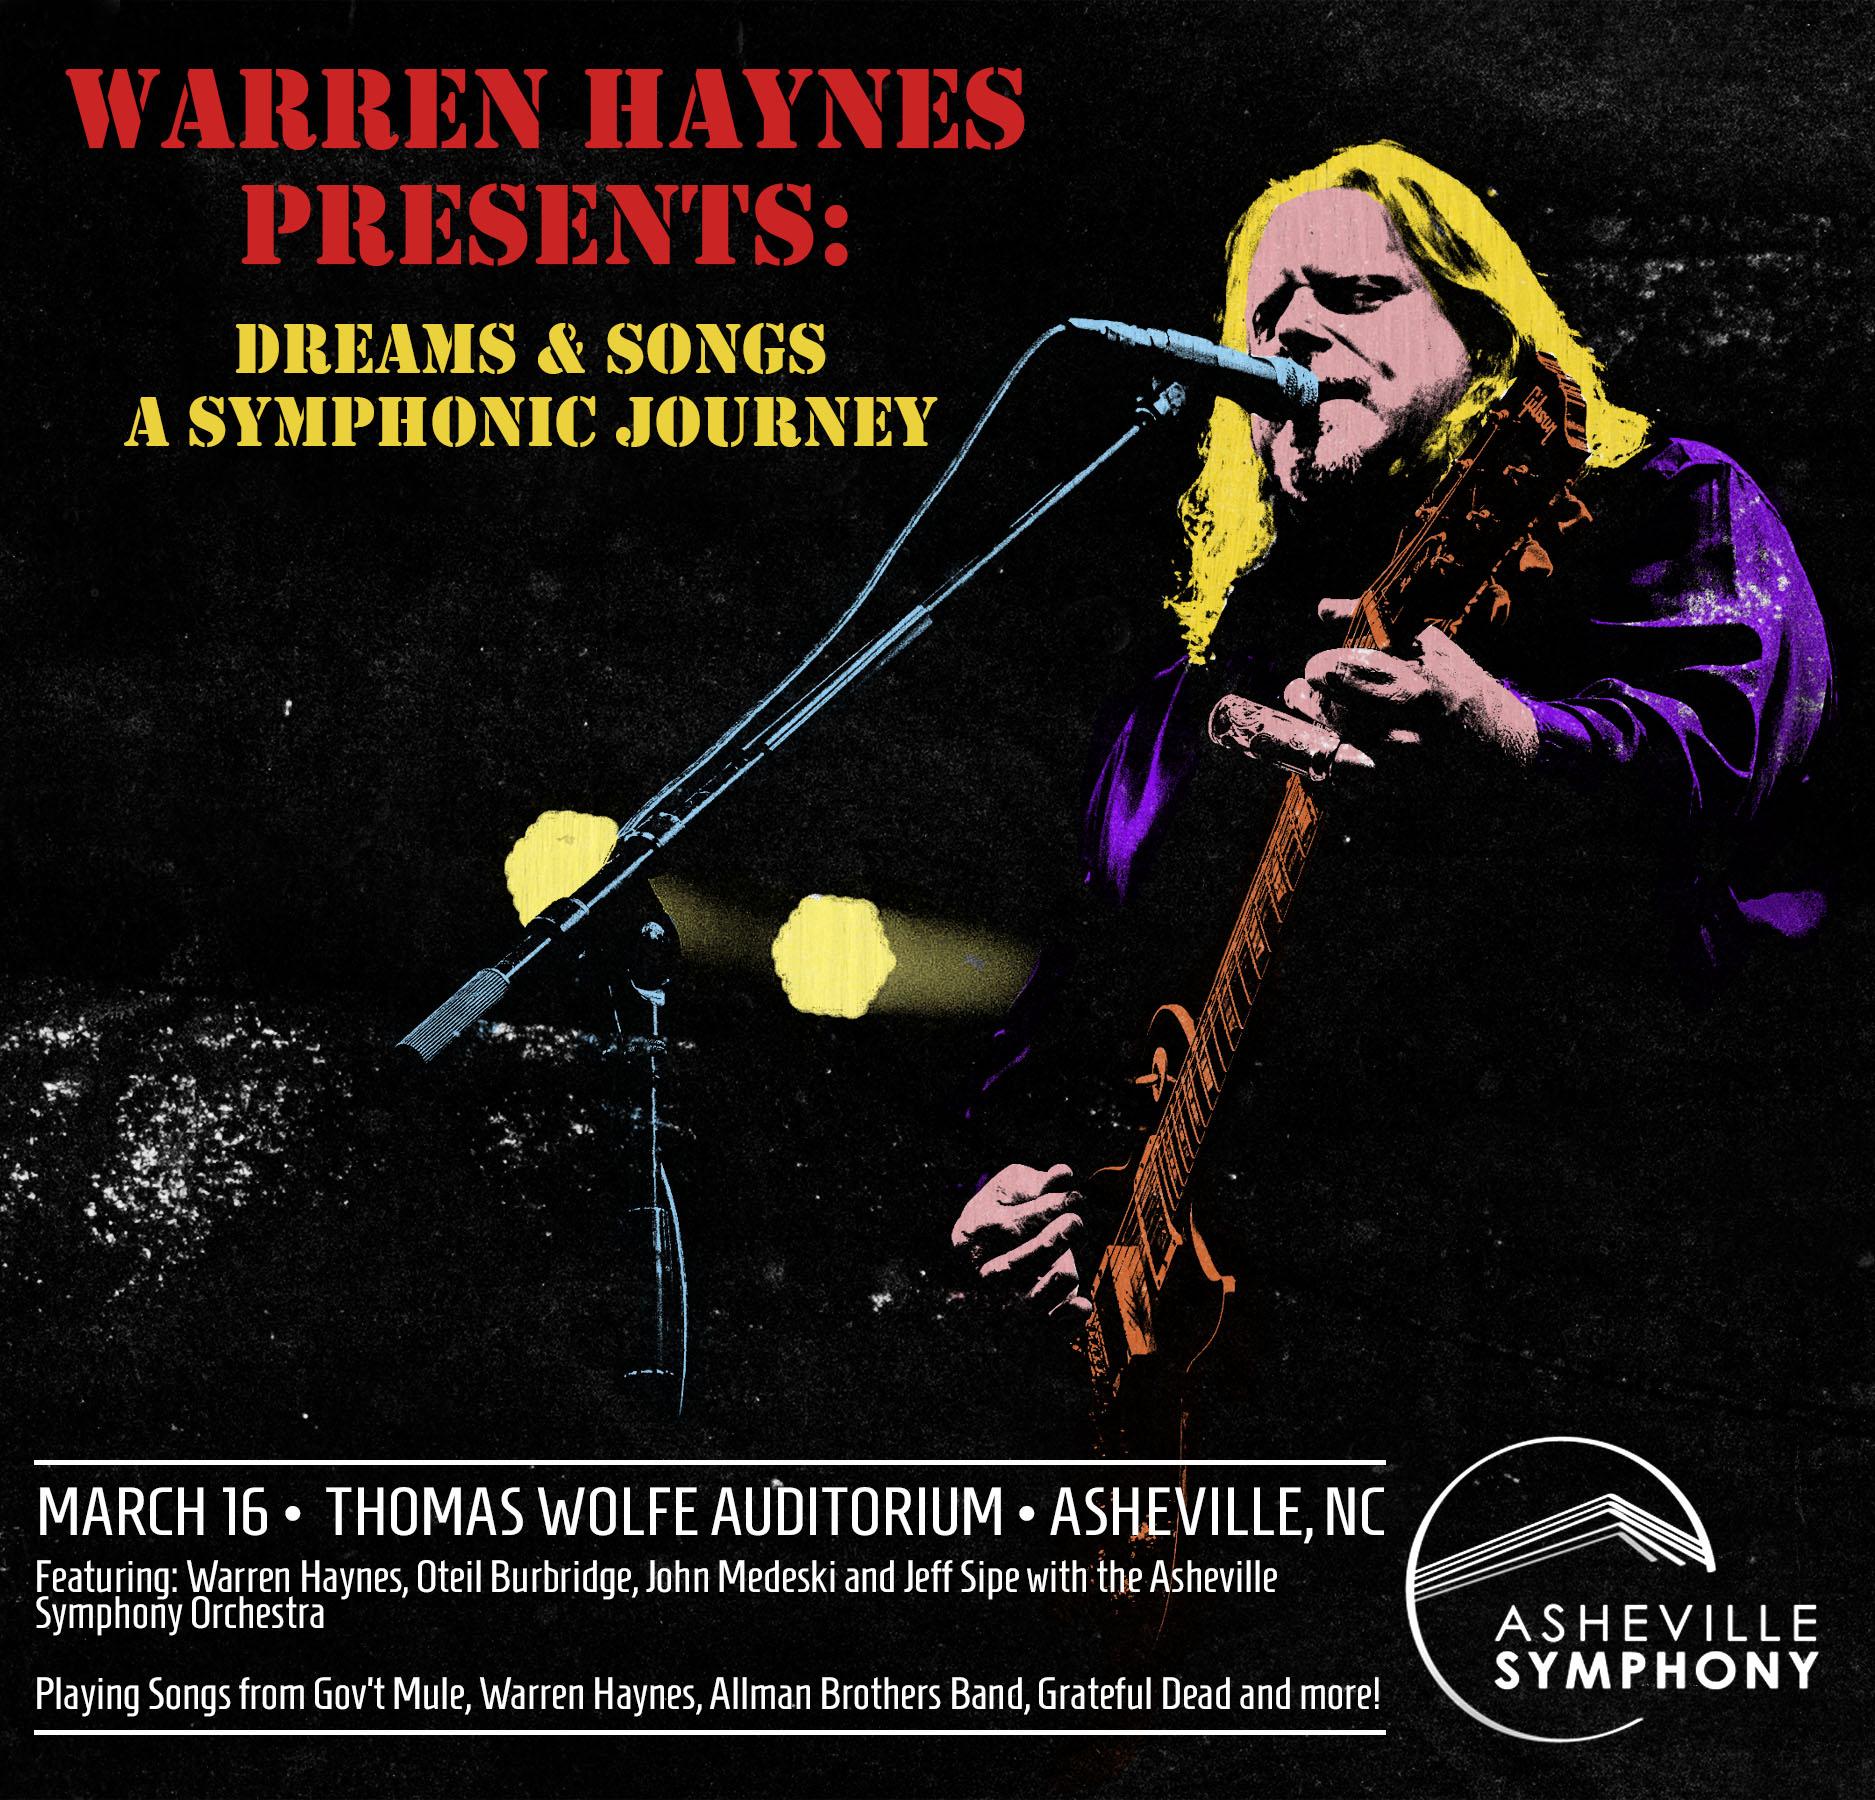 Warren Haynes Presents: Dreams & Songs - A Symphonic Journey